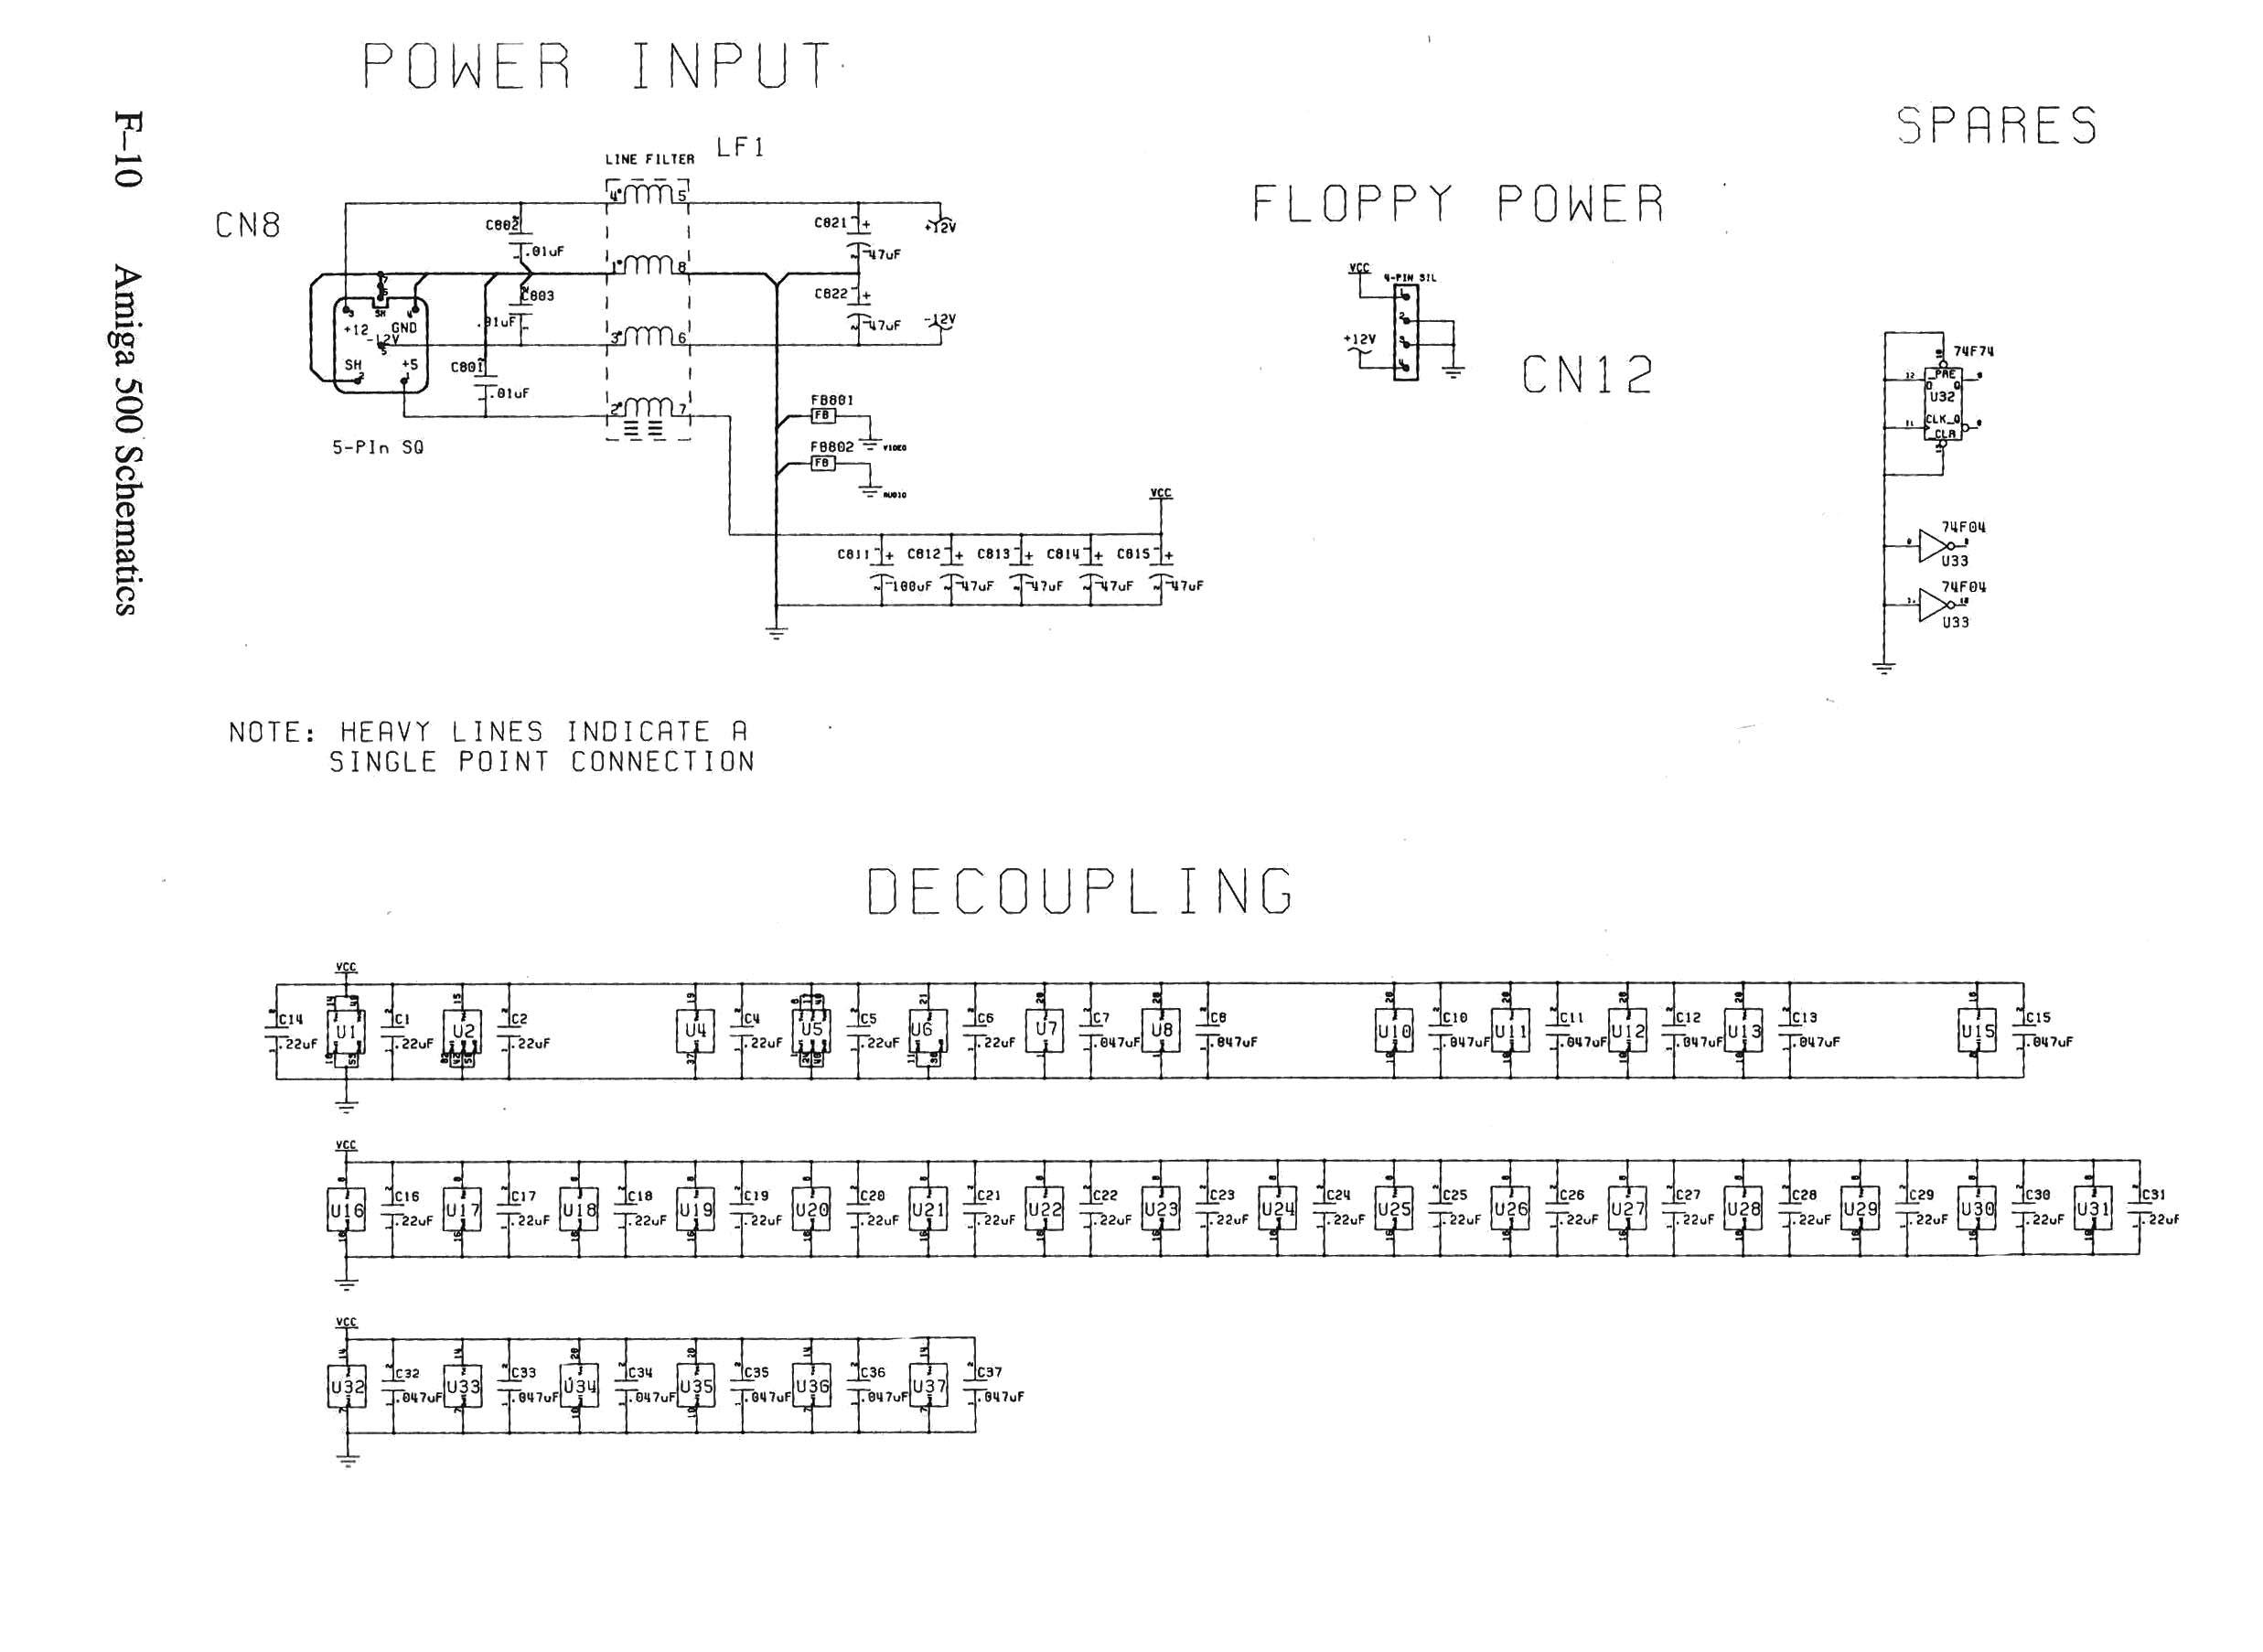 A500 Power Connector